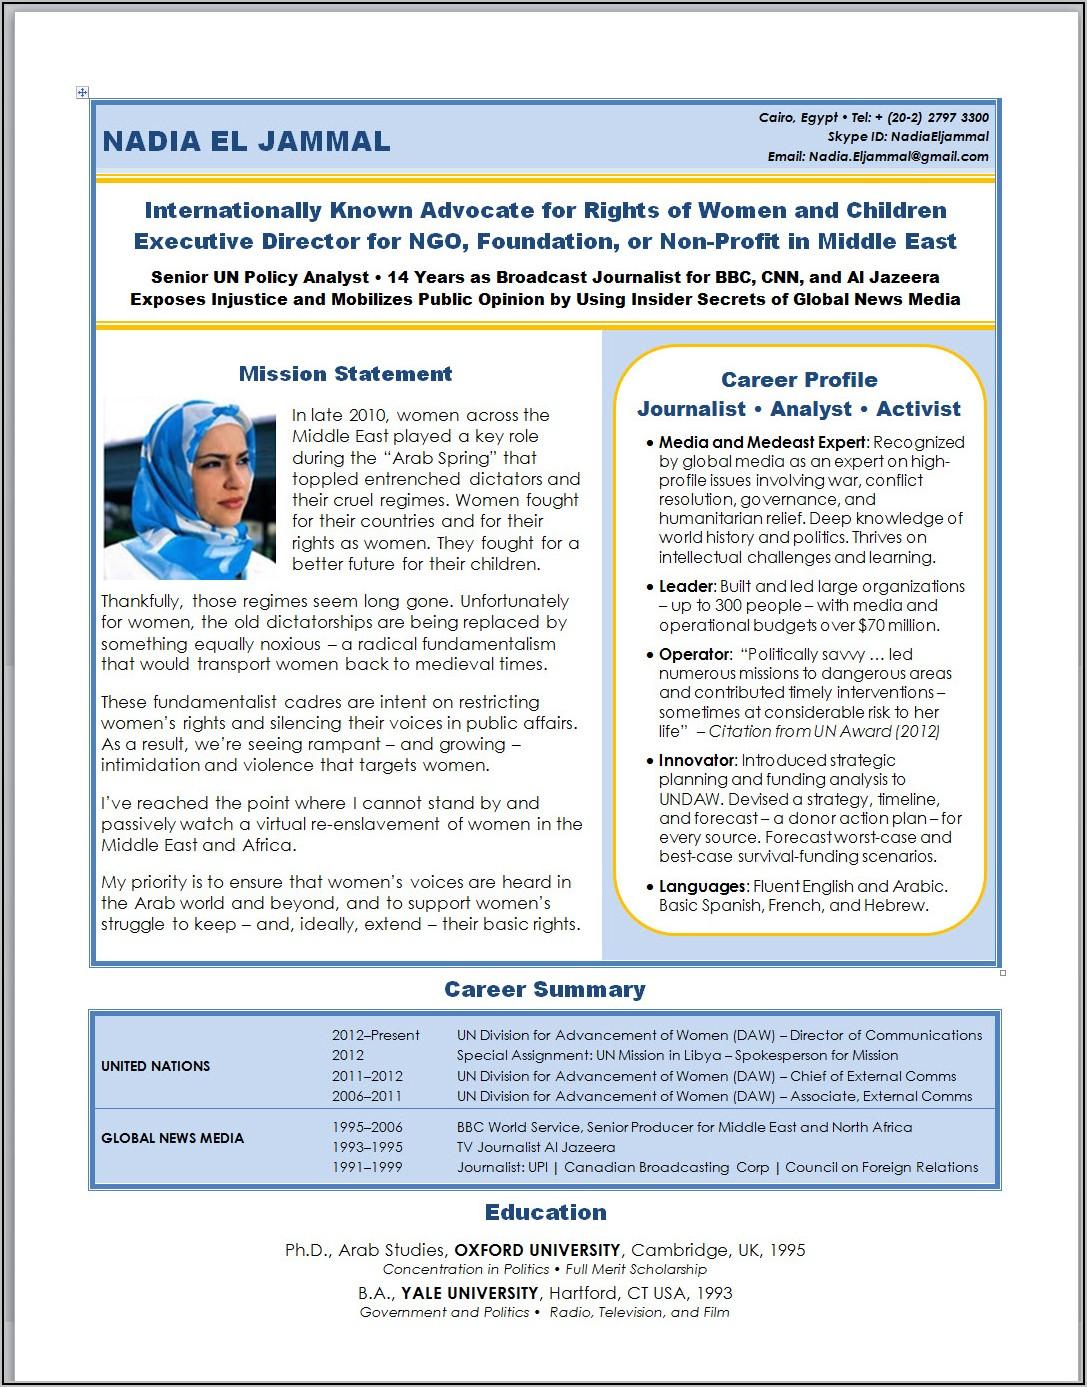 Resume For Experienced Registered Nurse